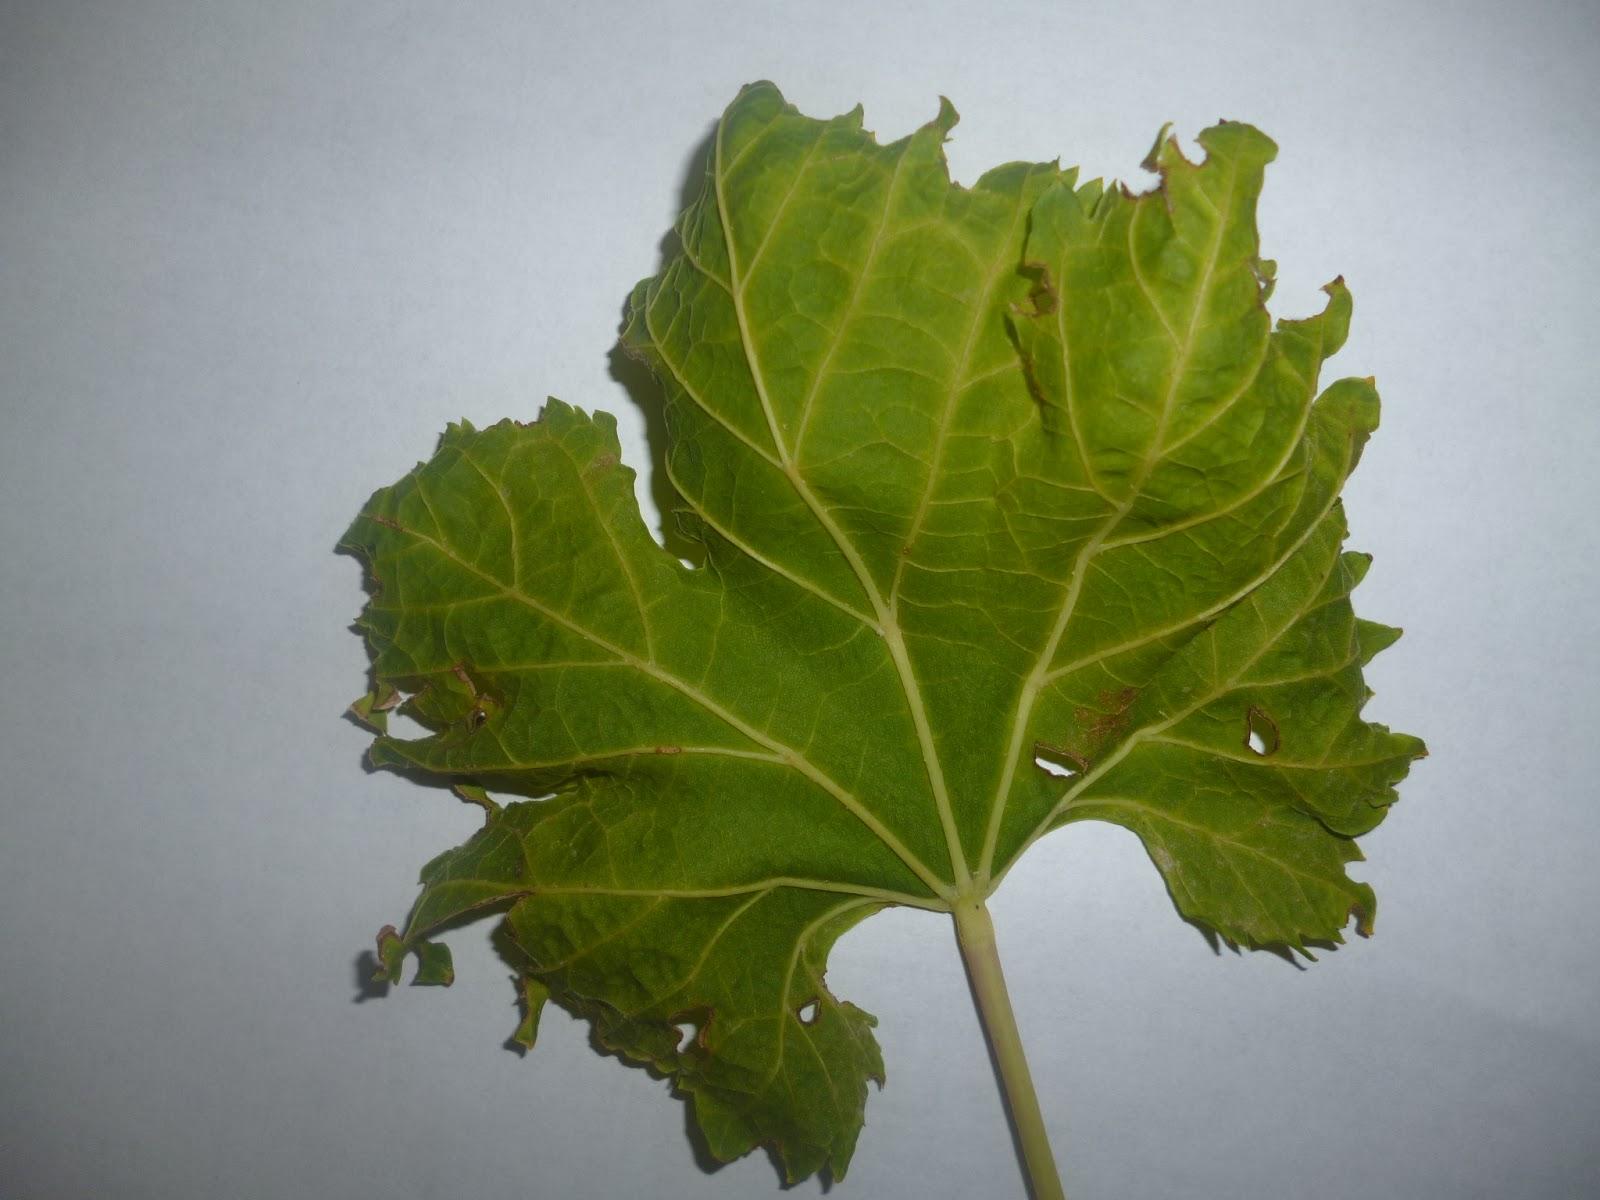 Resultado de imagen para hoja de viña afectada por glifosato